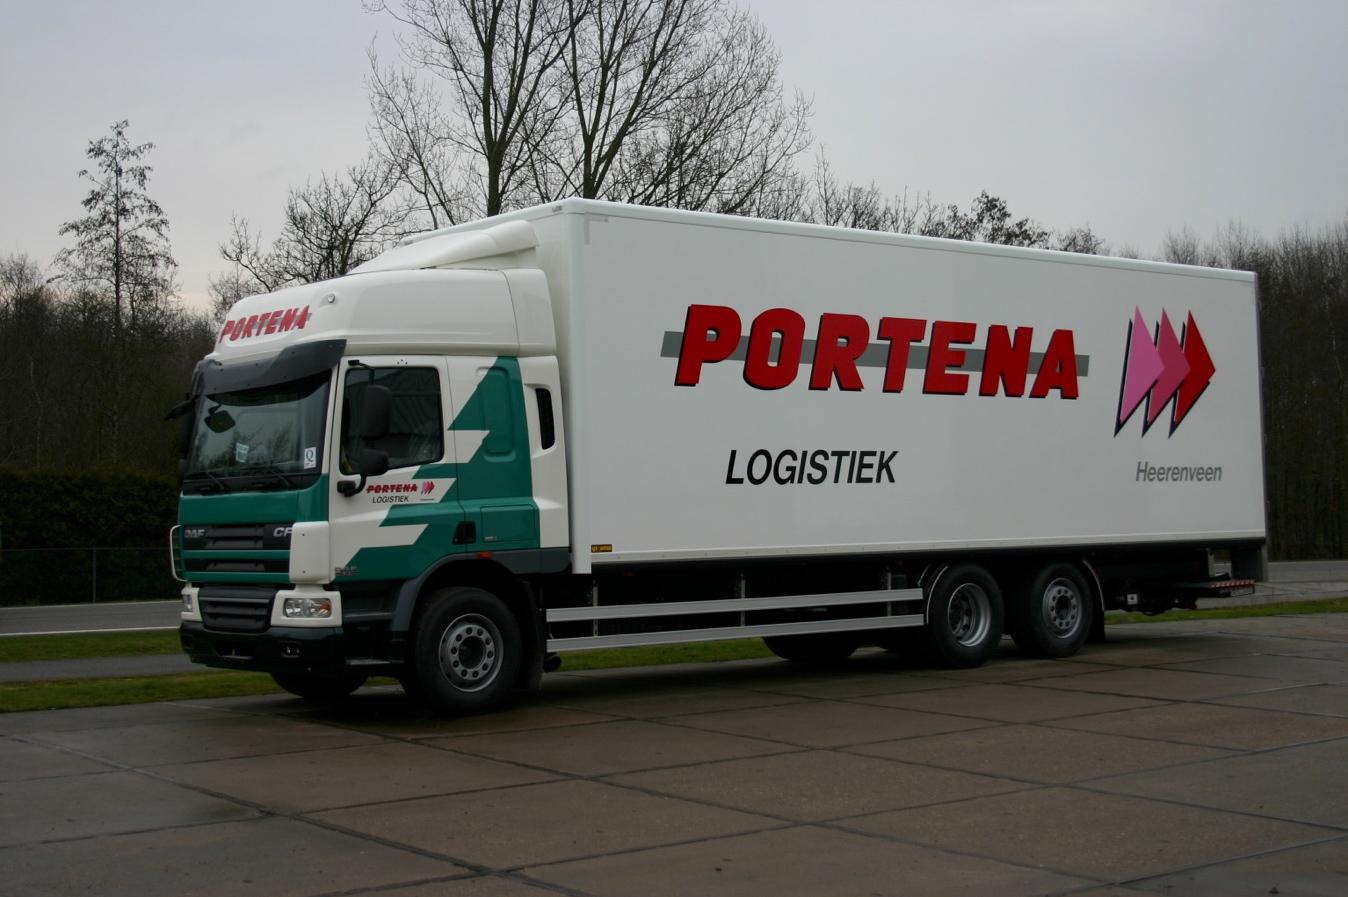 Portena logistiek gesloten carrosserie- 500kb.jpg